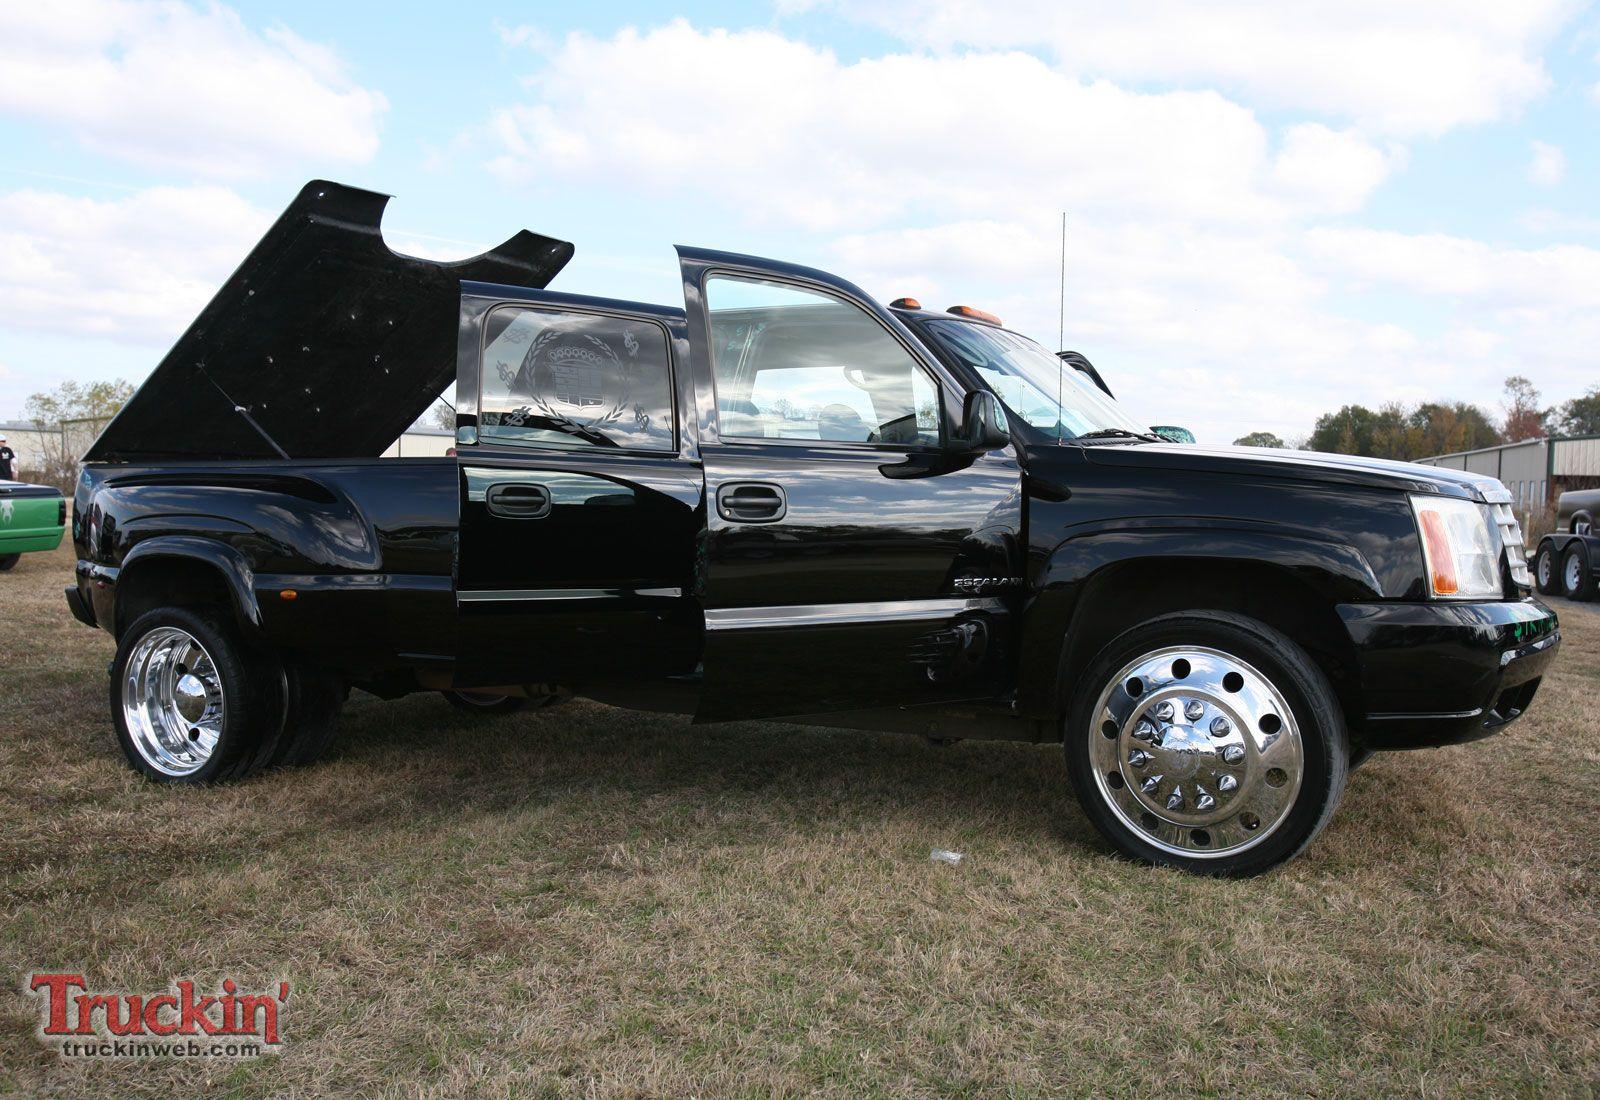 2010 Turkey Drag Truck Show Chevy Silverado 3500 Dually Photo 34